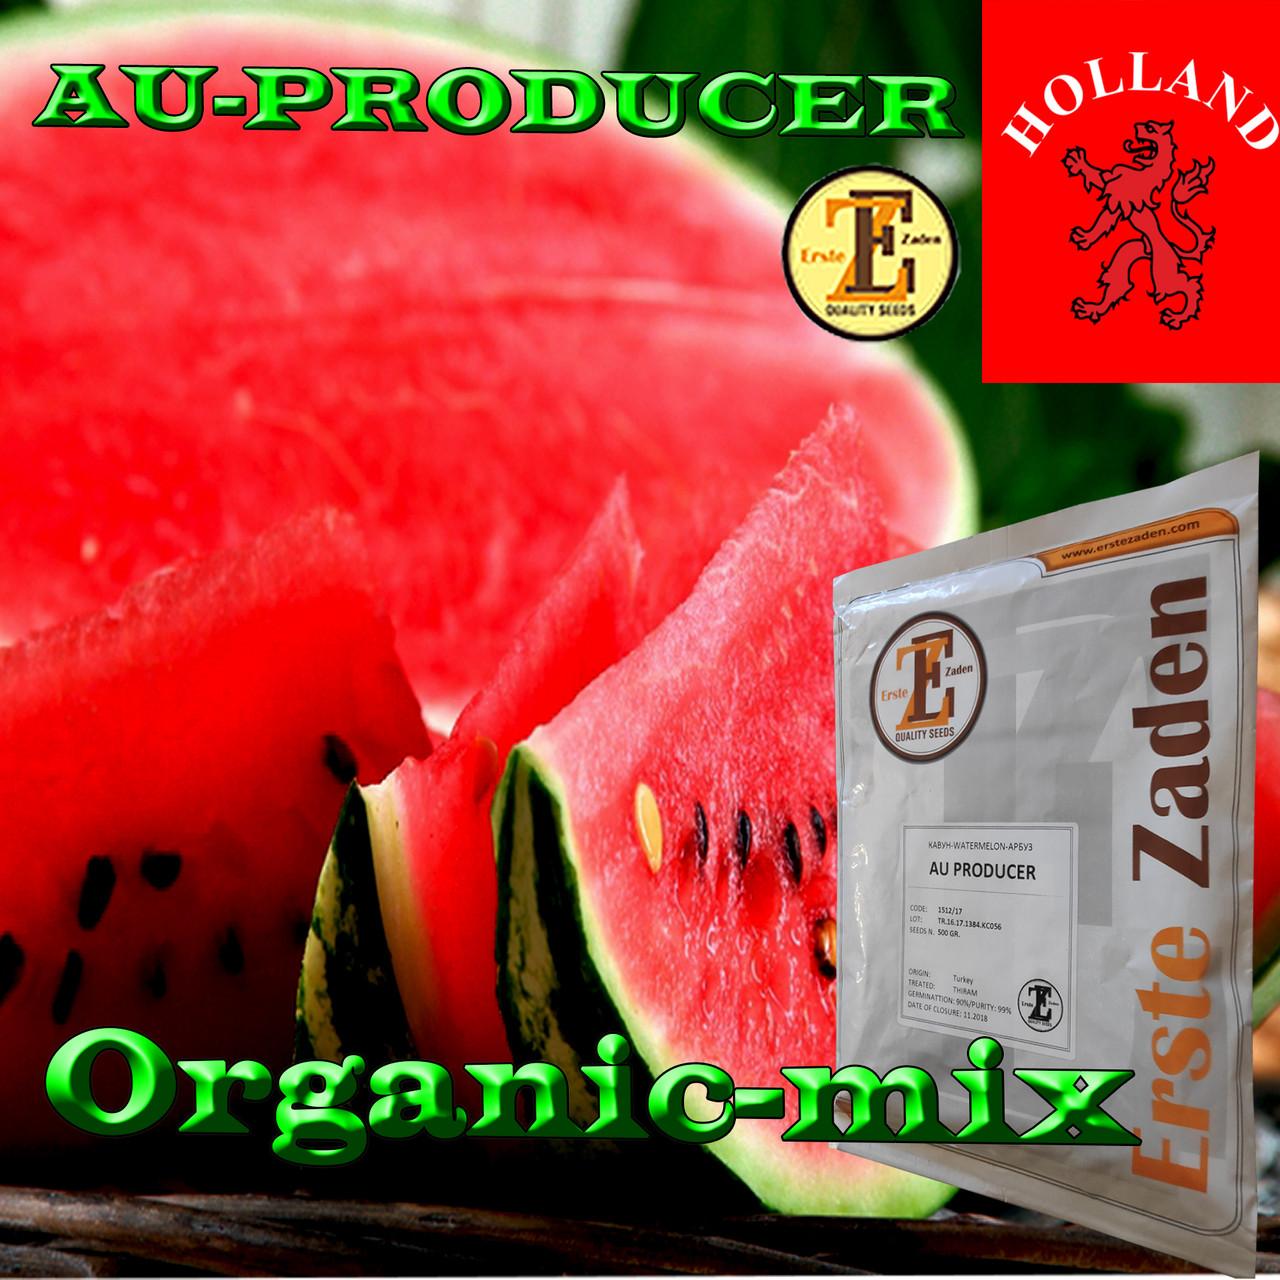 Семена, арбуз АУ Продюсер, Erste Zaden (Турция / Голландия), проф.пакет 500 грамм